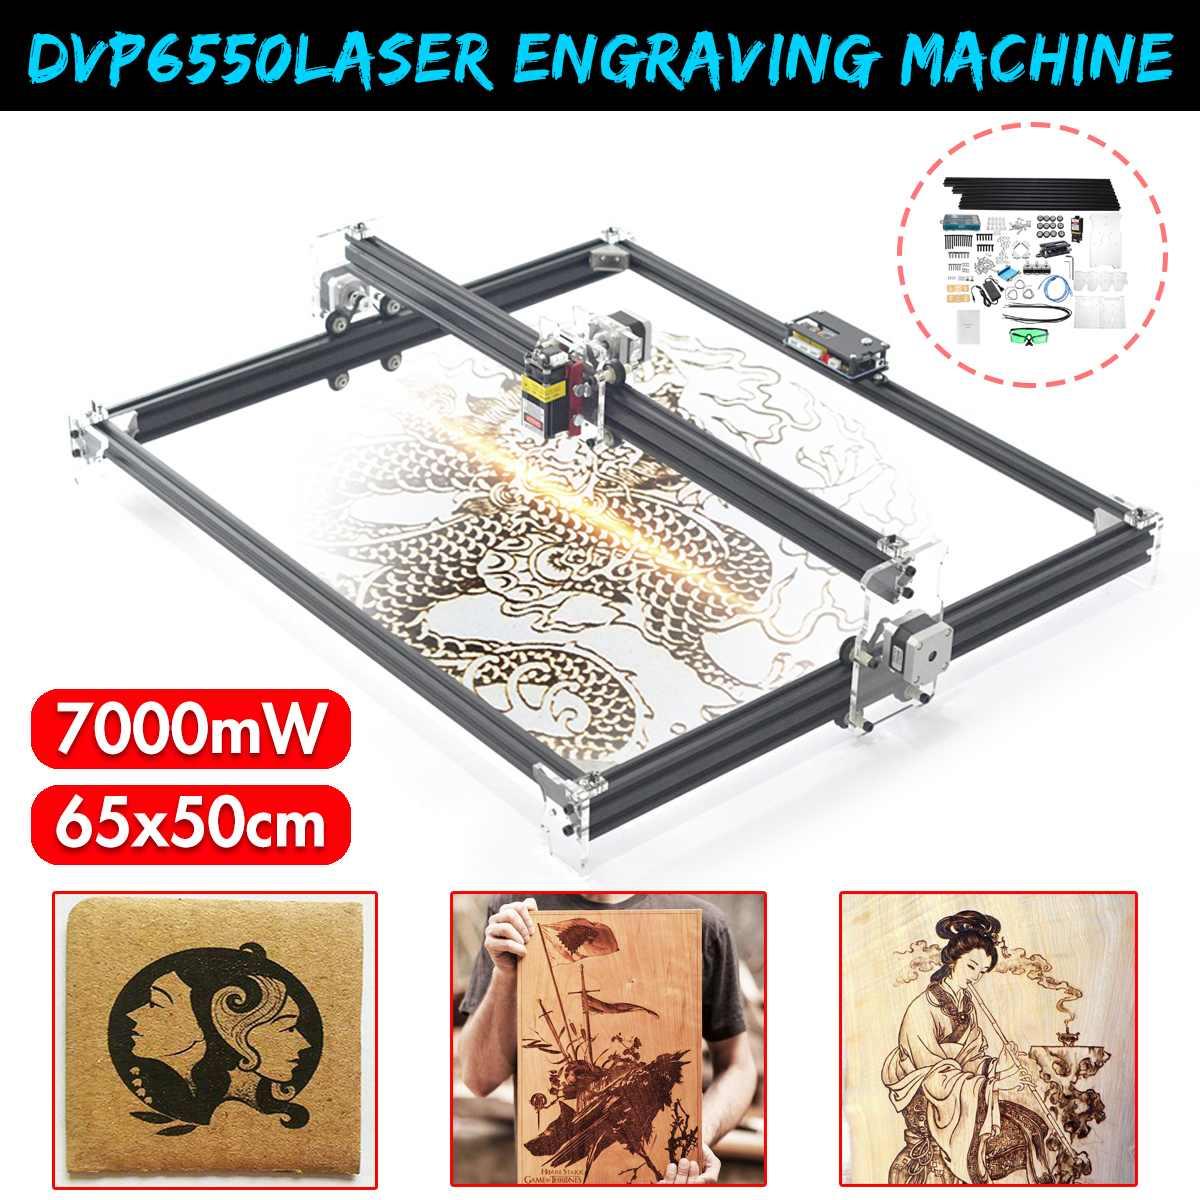 DVP6550 7000MW/6000MW/3000MW Blue CNC Laser Engraving Machine 2Axis DC 12V DIY Engraver Desktop Wood Router/Cutter/Printer+Laser